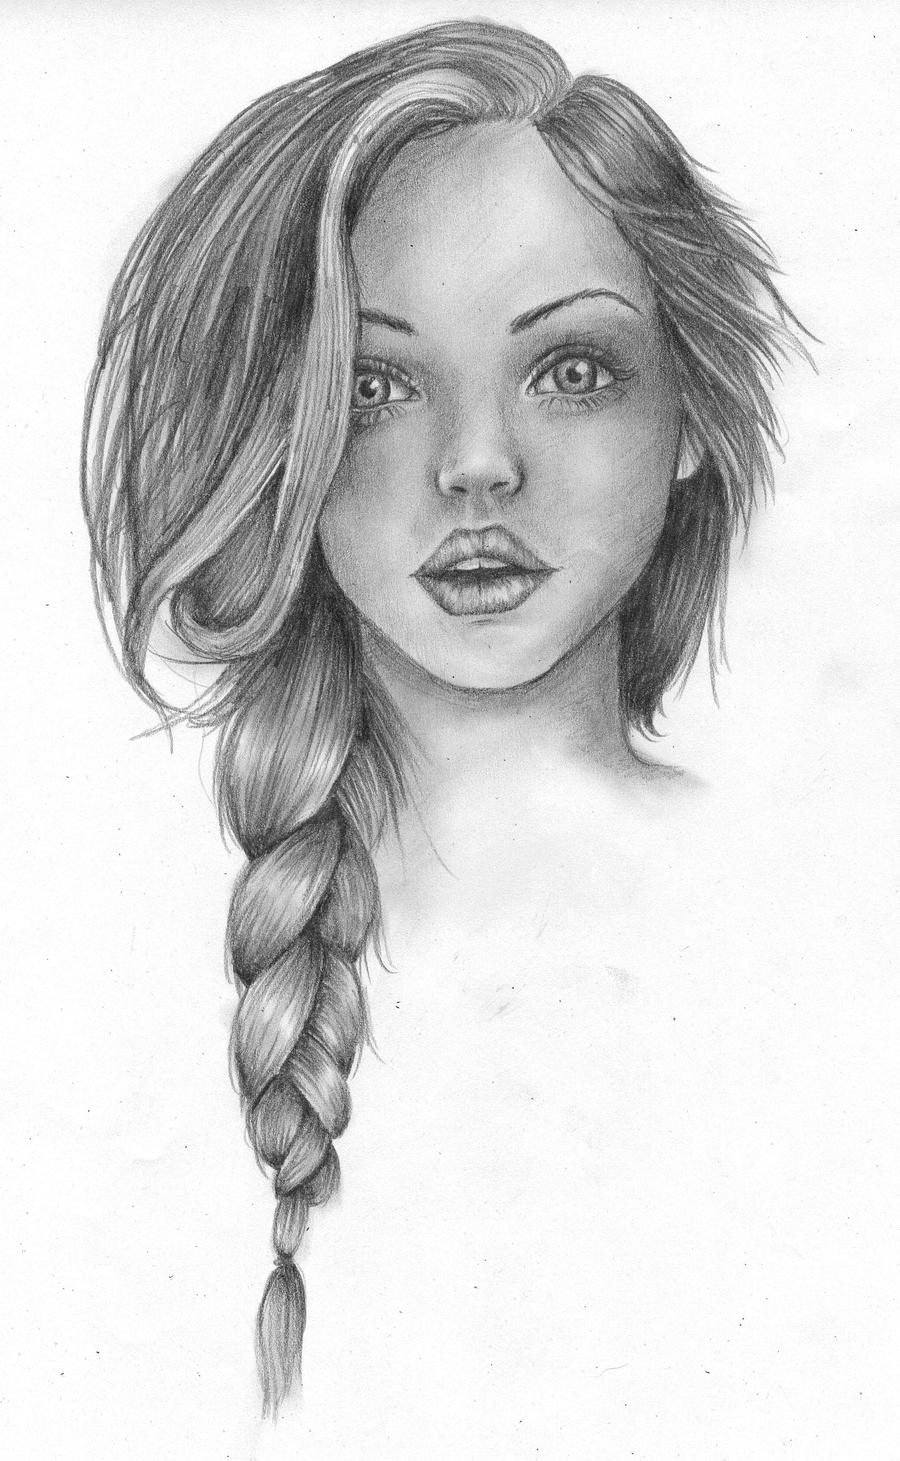 Pretty woman by ilikeyourdad on deviantart for Pretty sketches